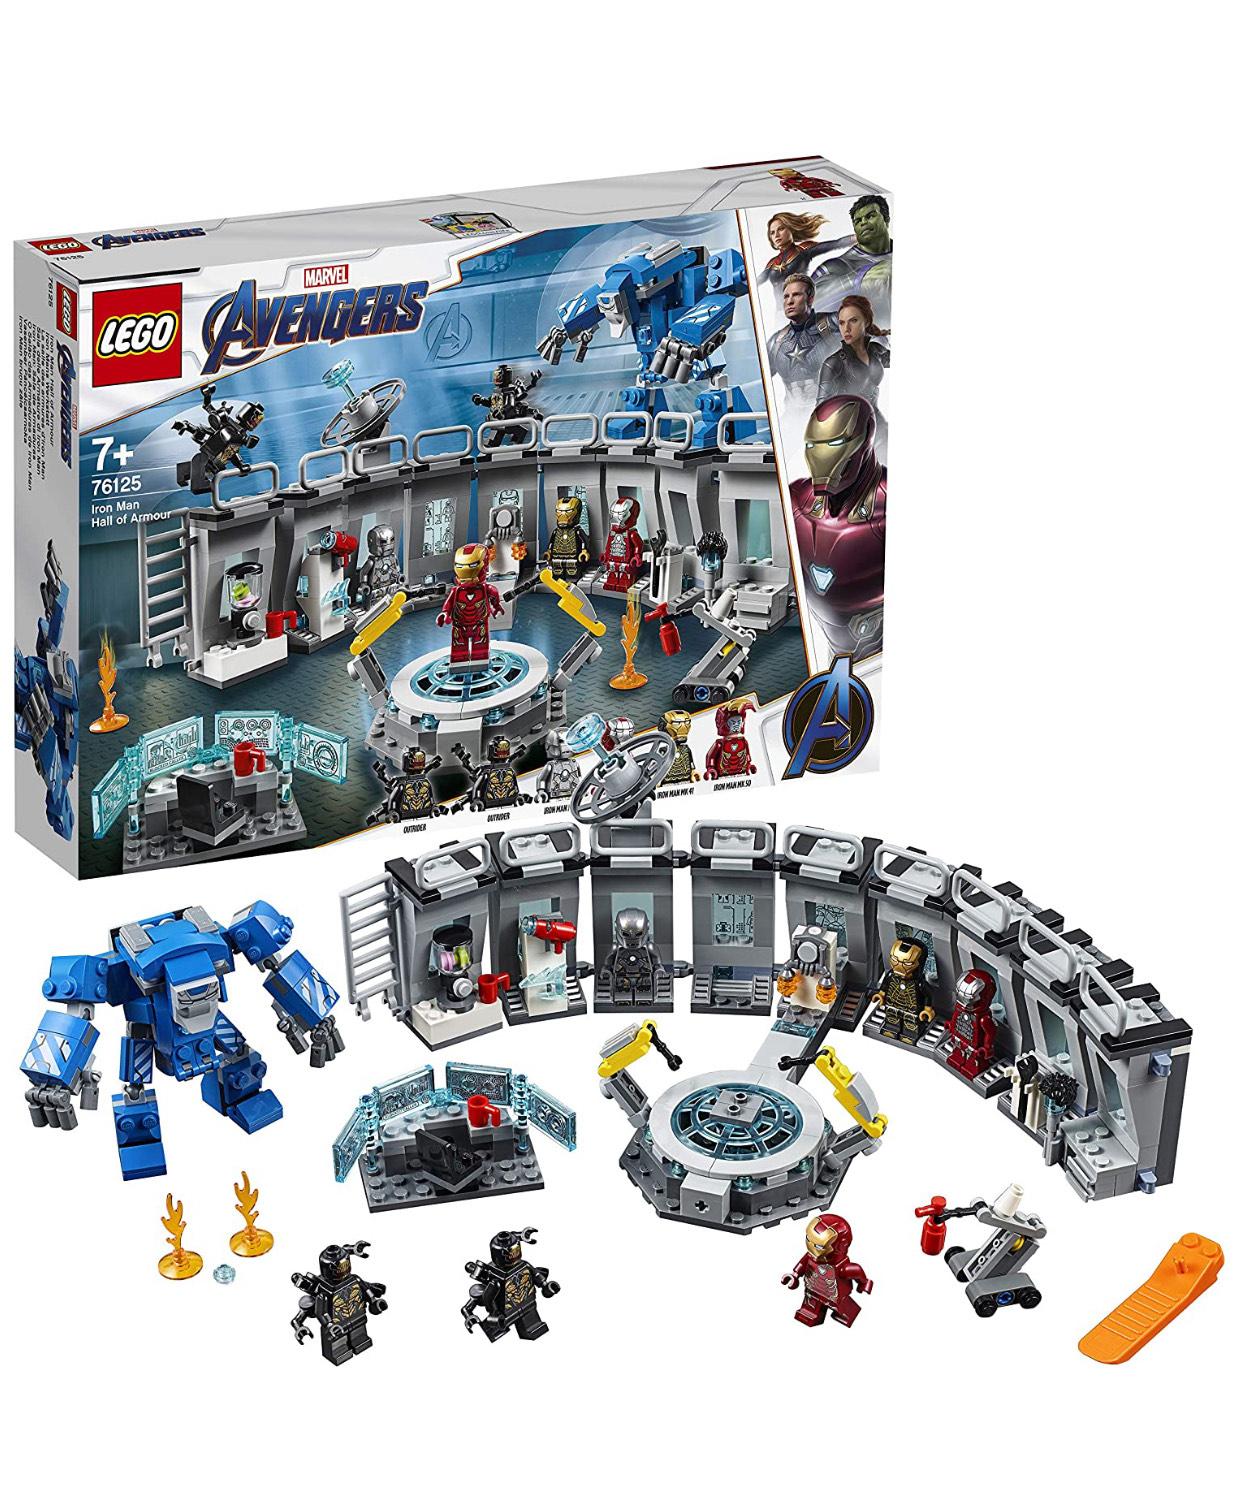 LEGO Marvel Avengers 76125 Iron Man Hall of Armor Lab Set £41.99 at Smyths Toys